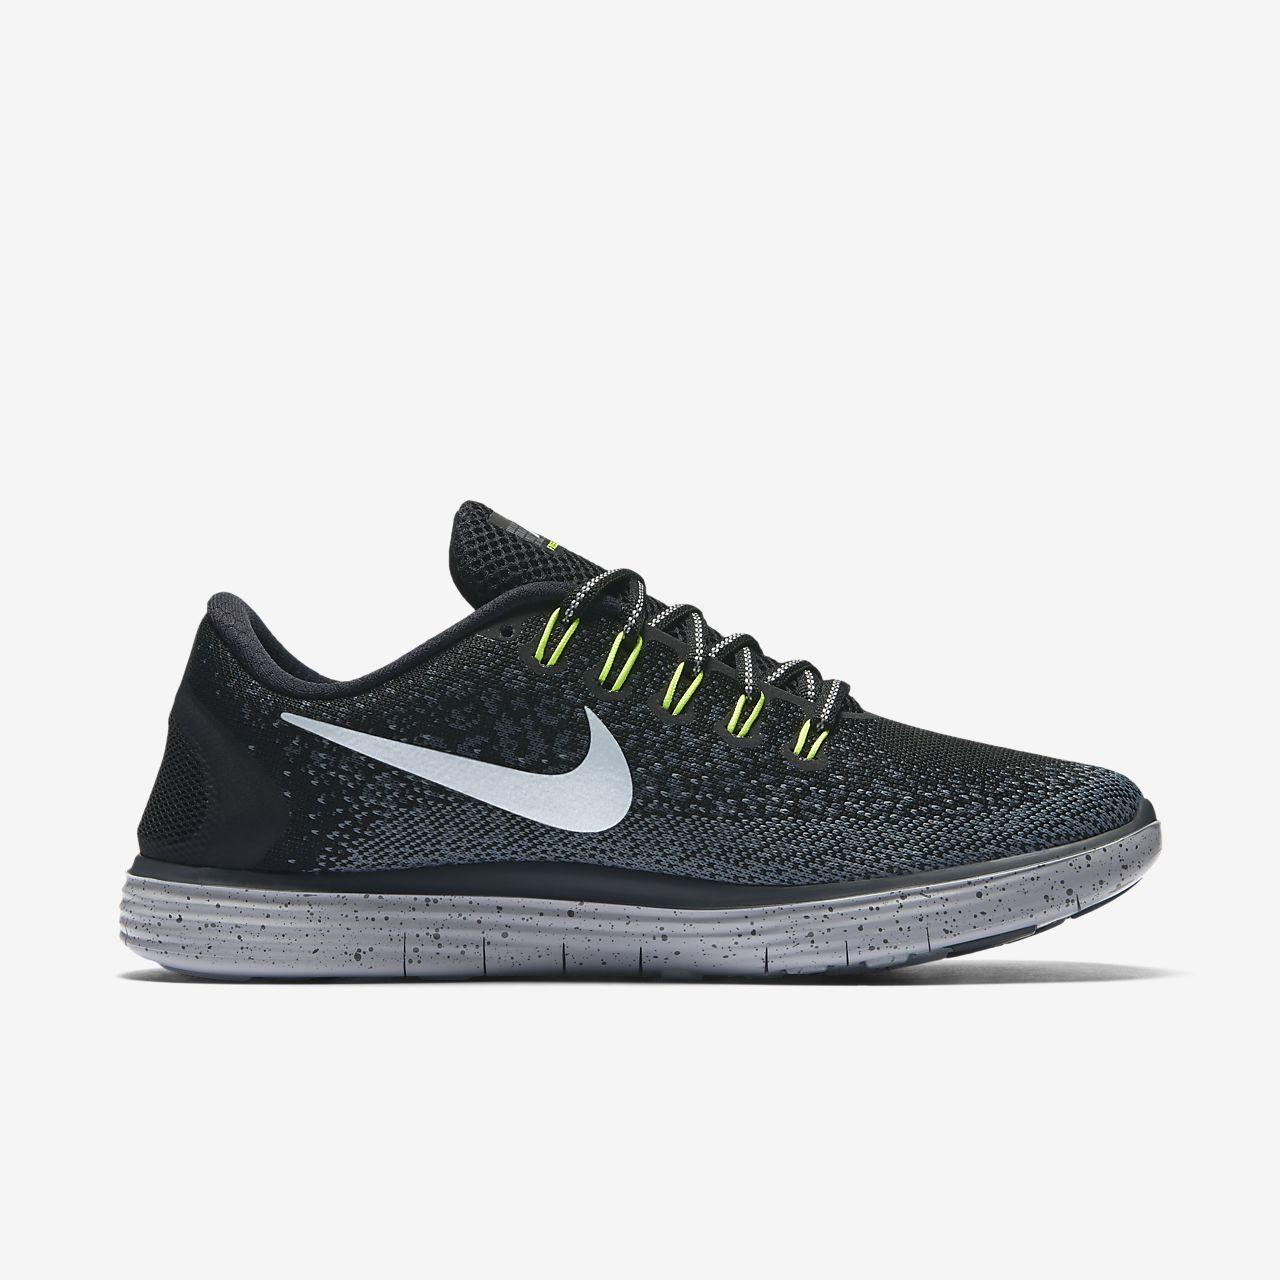 1c4ac713616 Chaussure De Running Nike Free Rn Distance Distance Distance Shield Pour  Nike 423a95